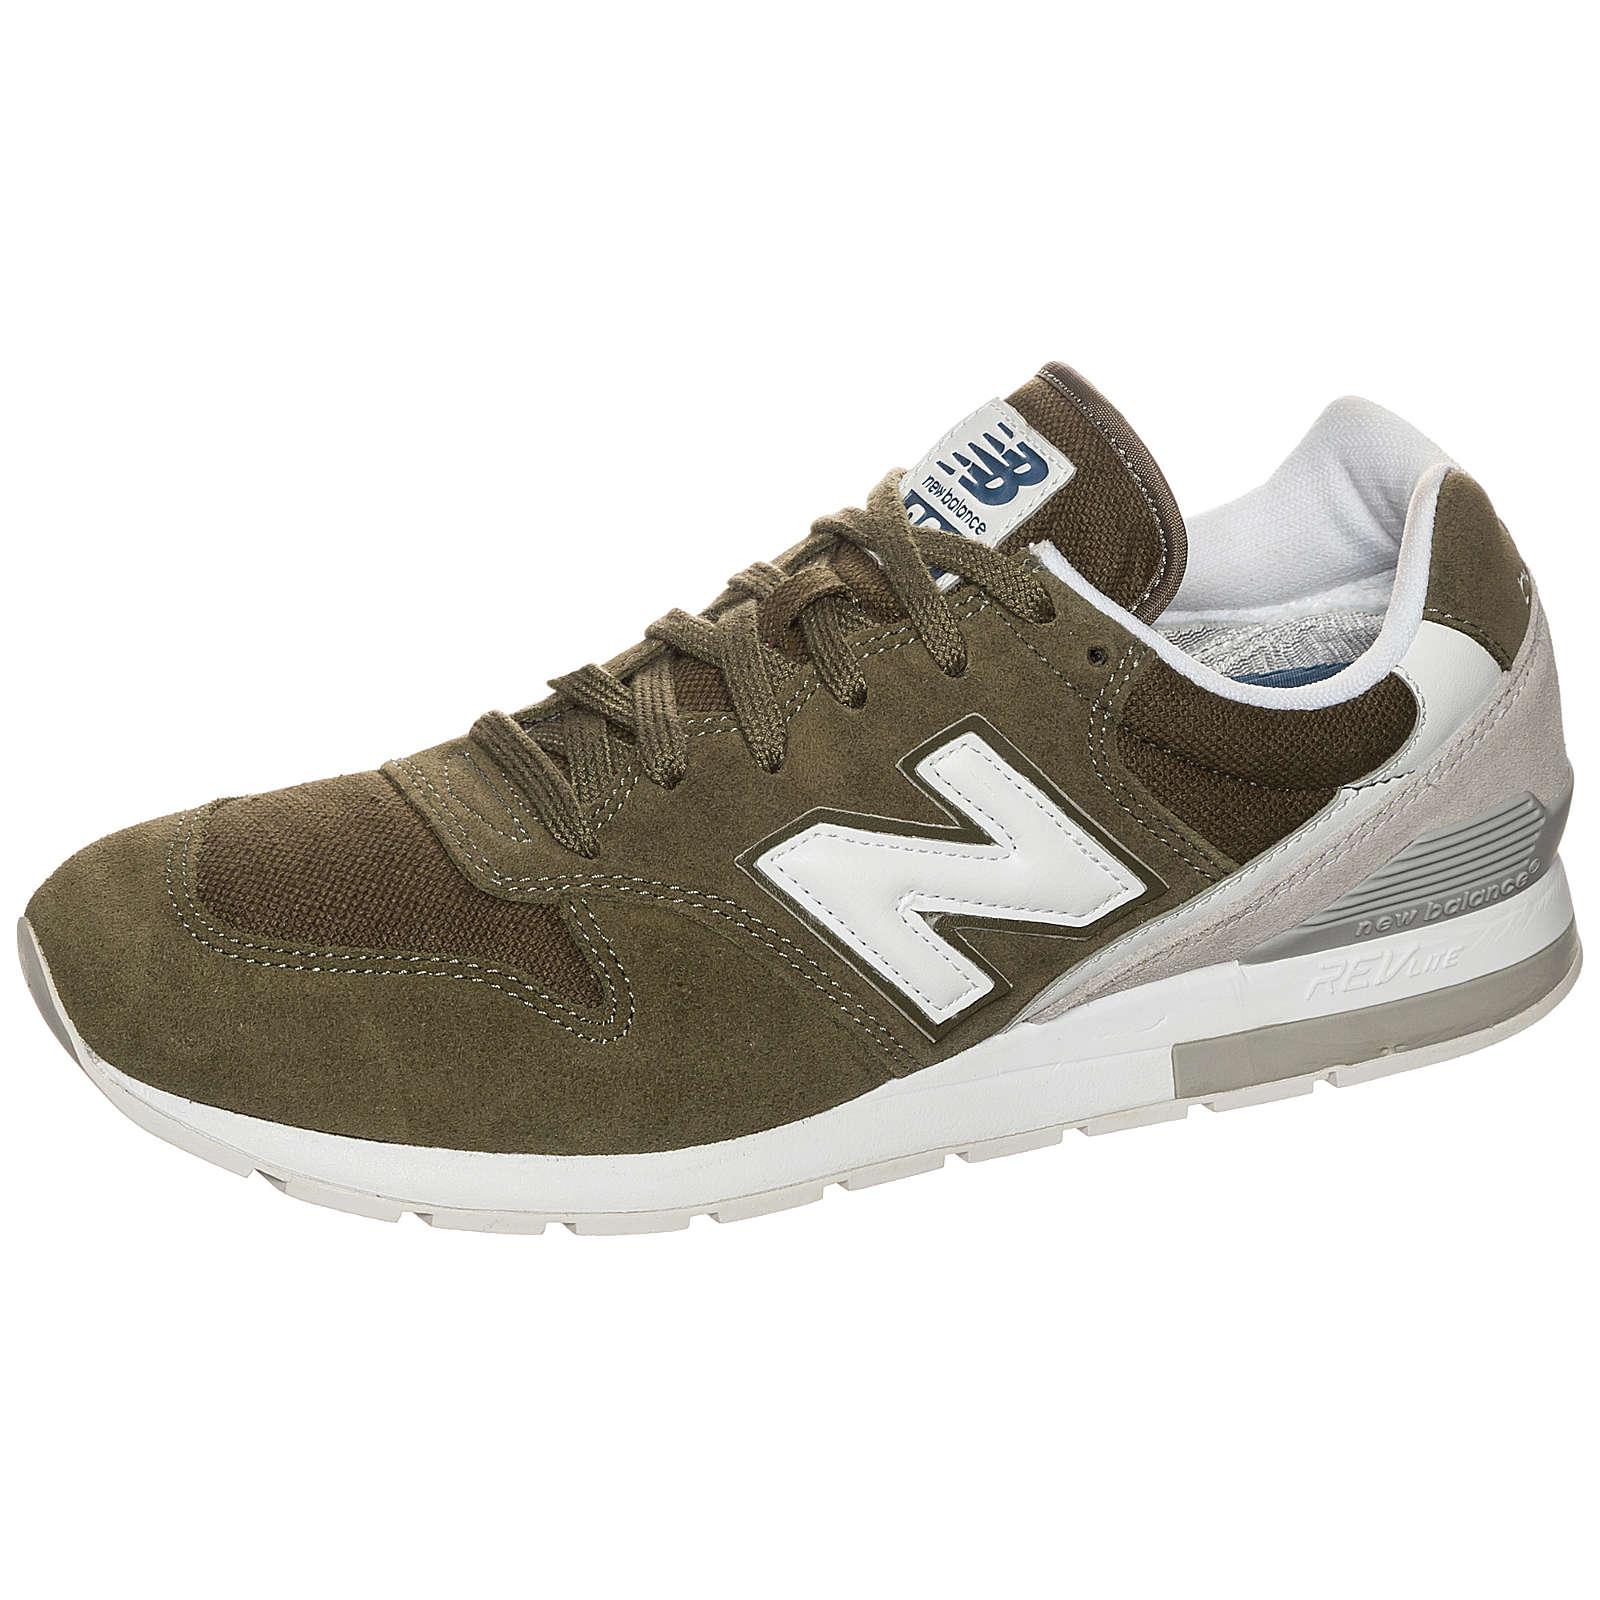 new balance MRL996 Sneakers Low grün Herren Gr. 44,5